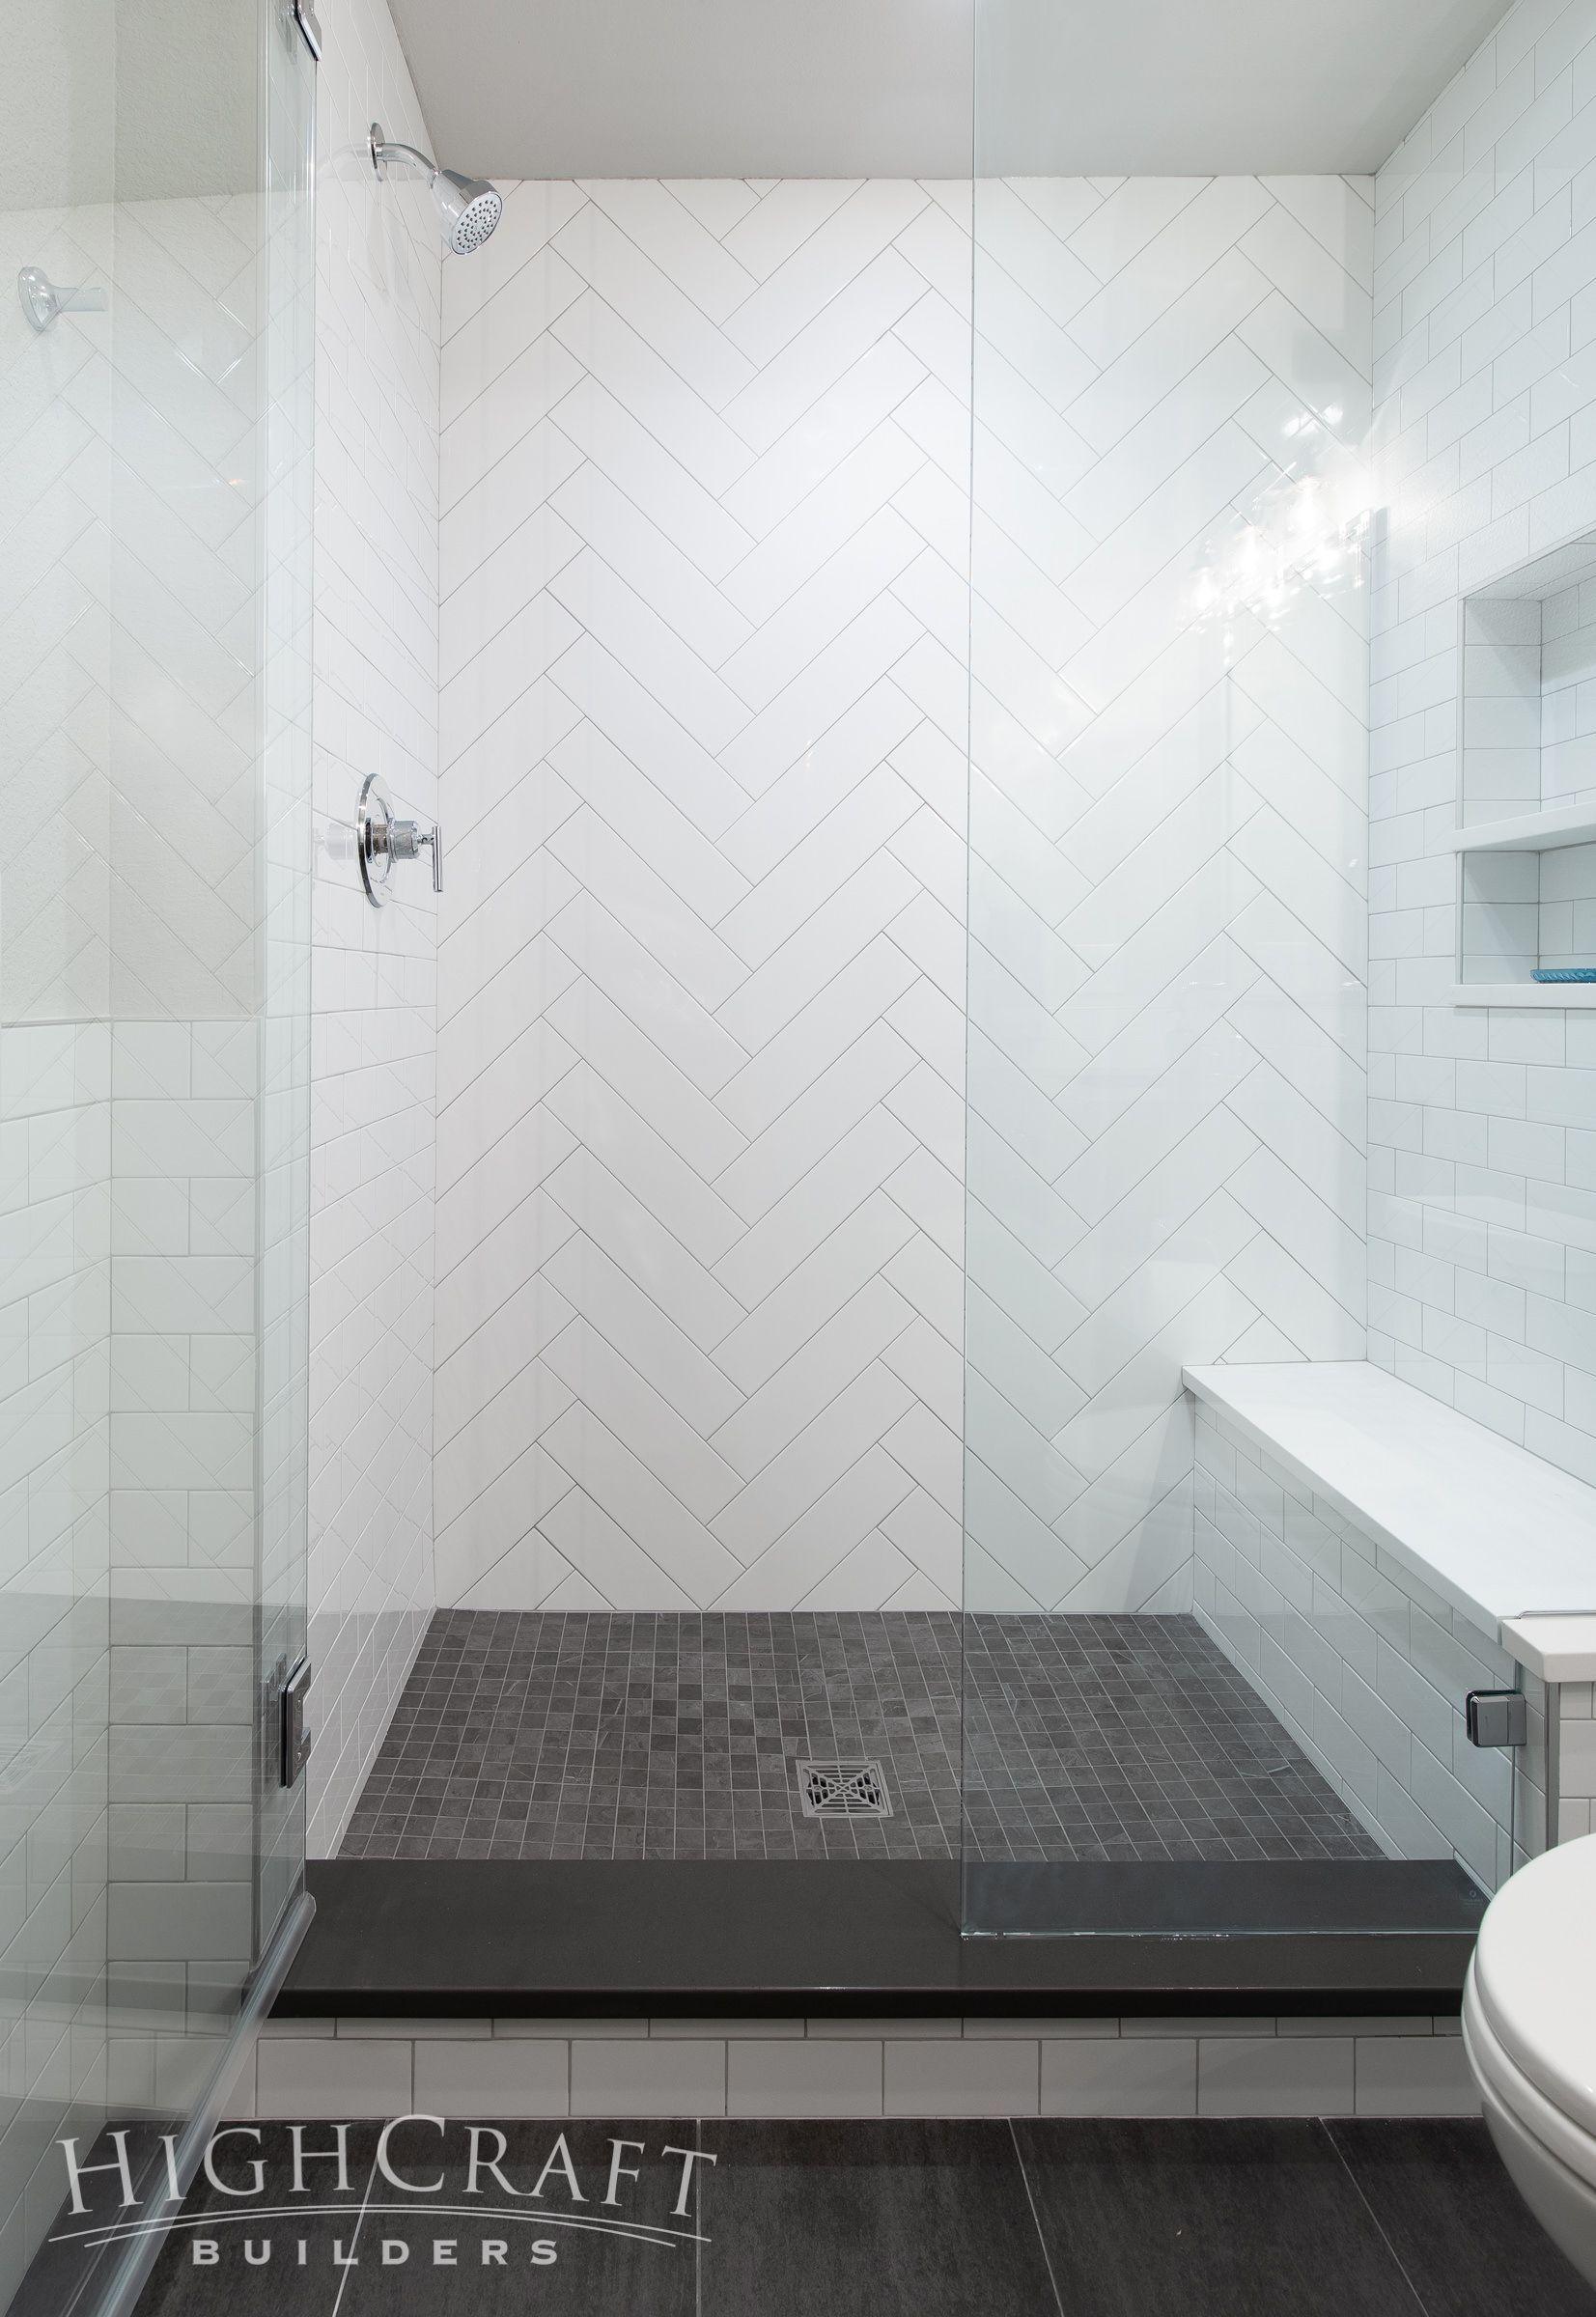 And 4 16 White Subway Tiles Create A Herringbone Accent Wall In The Shower Basementbathroom Bathroom Interior Tile Bathroom Bathrooms Remodel